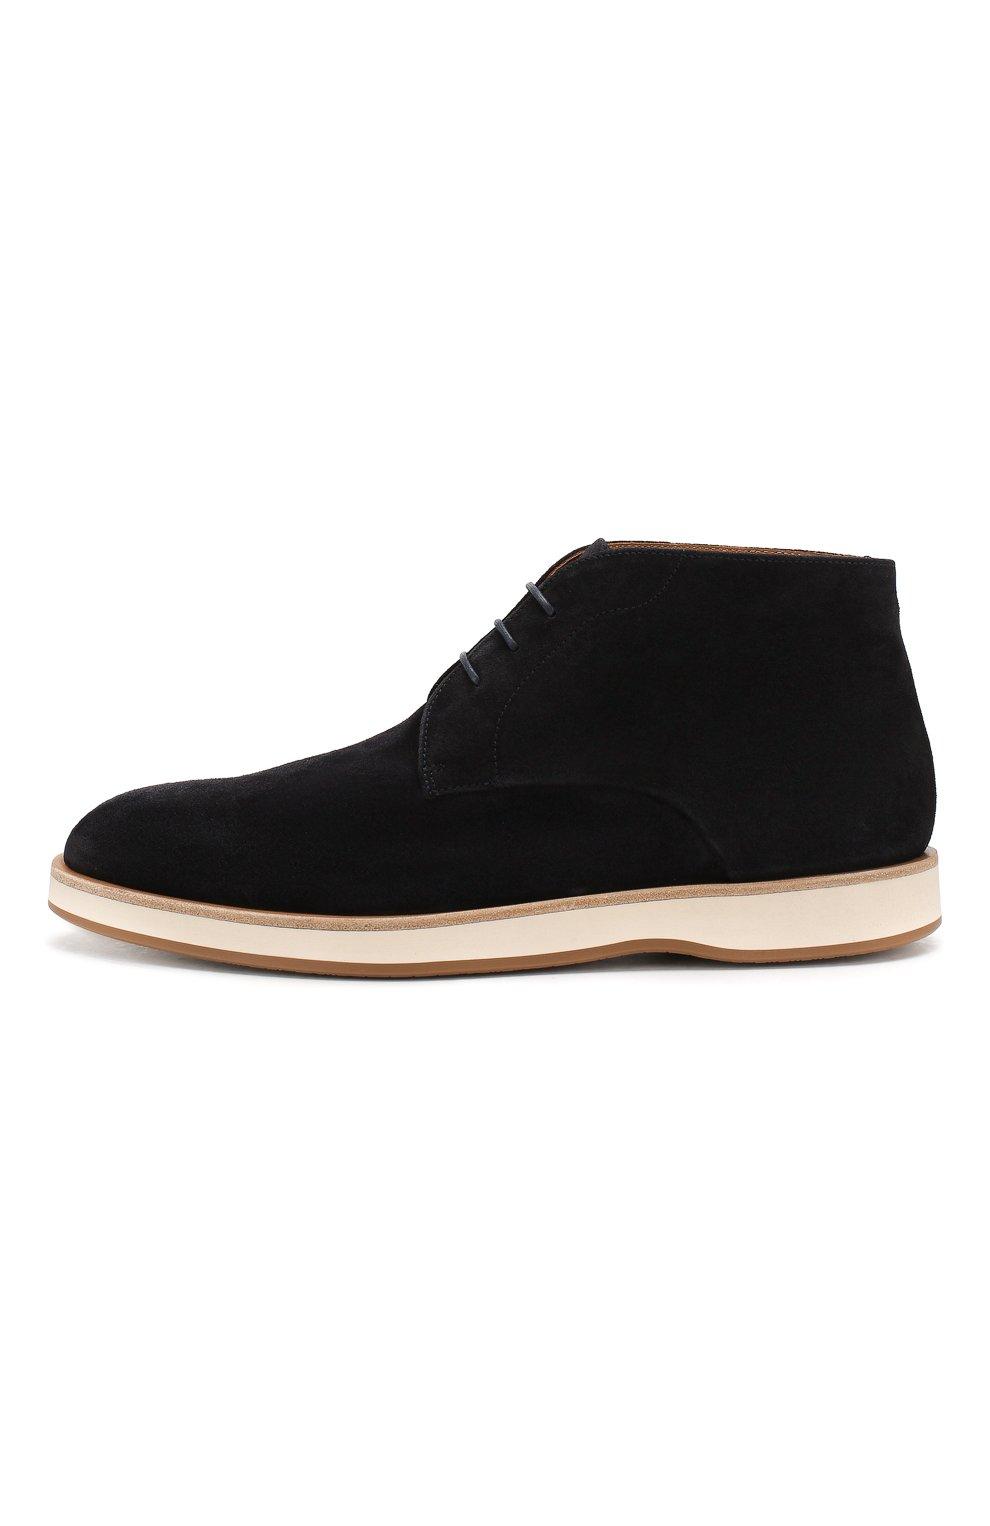 Мужские замшевые ботинки BOSS синего цвета, арт. 50407945 | Фото 3